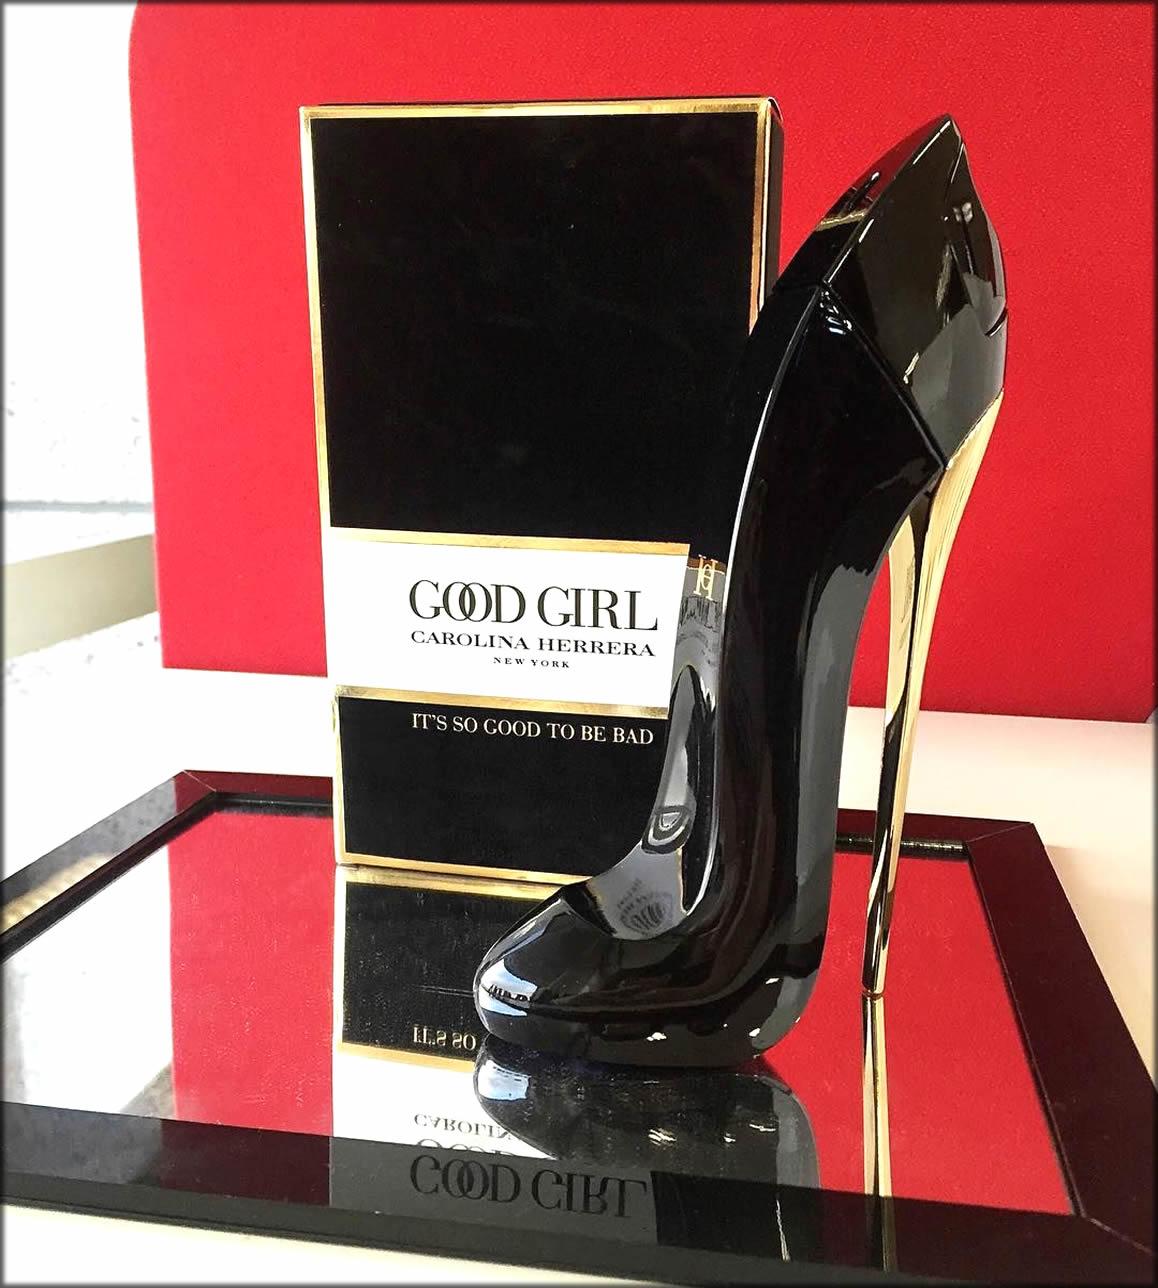 New York Good Girl Carolina Herrera